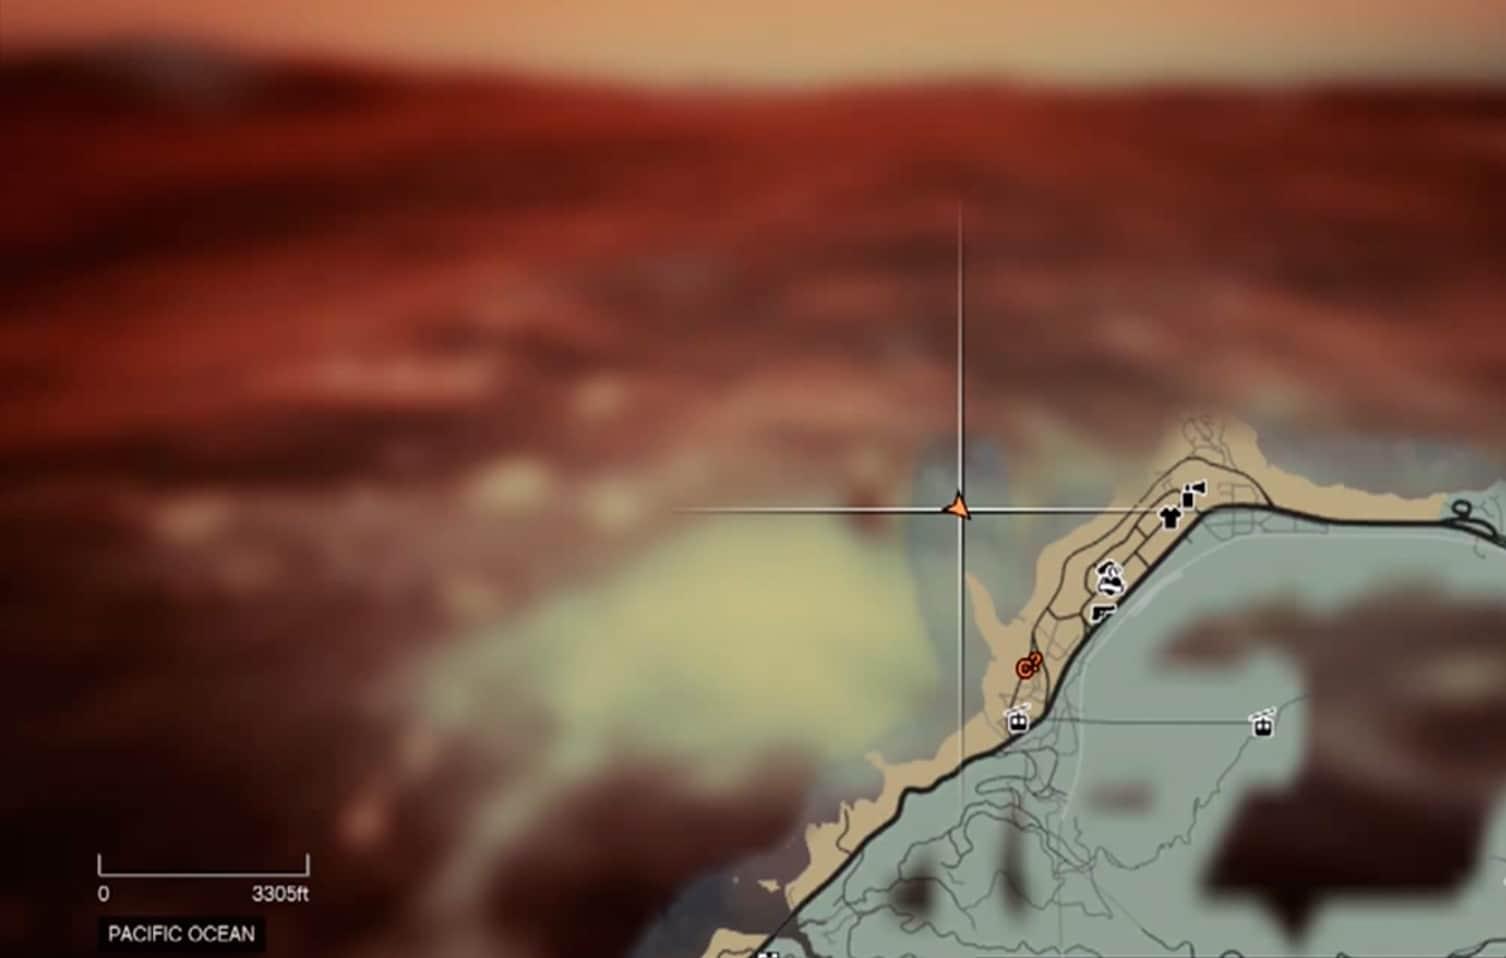 gta money sunken location treasure plane box para ocean right hilesi hints tips cheats ucak sınırsız making should gizli theft